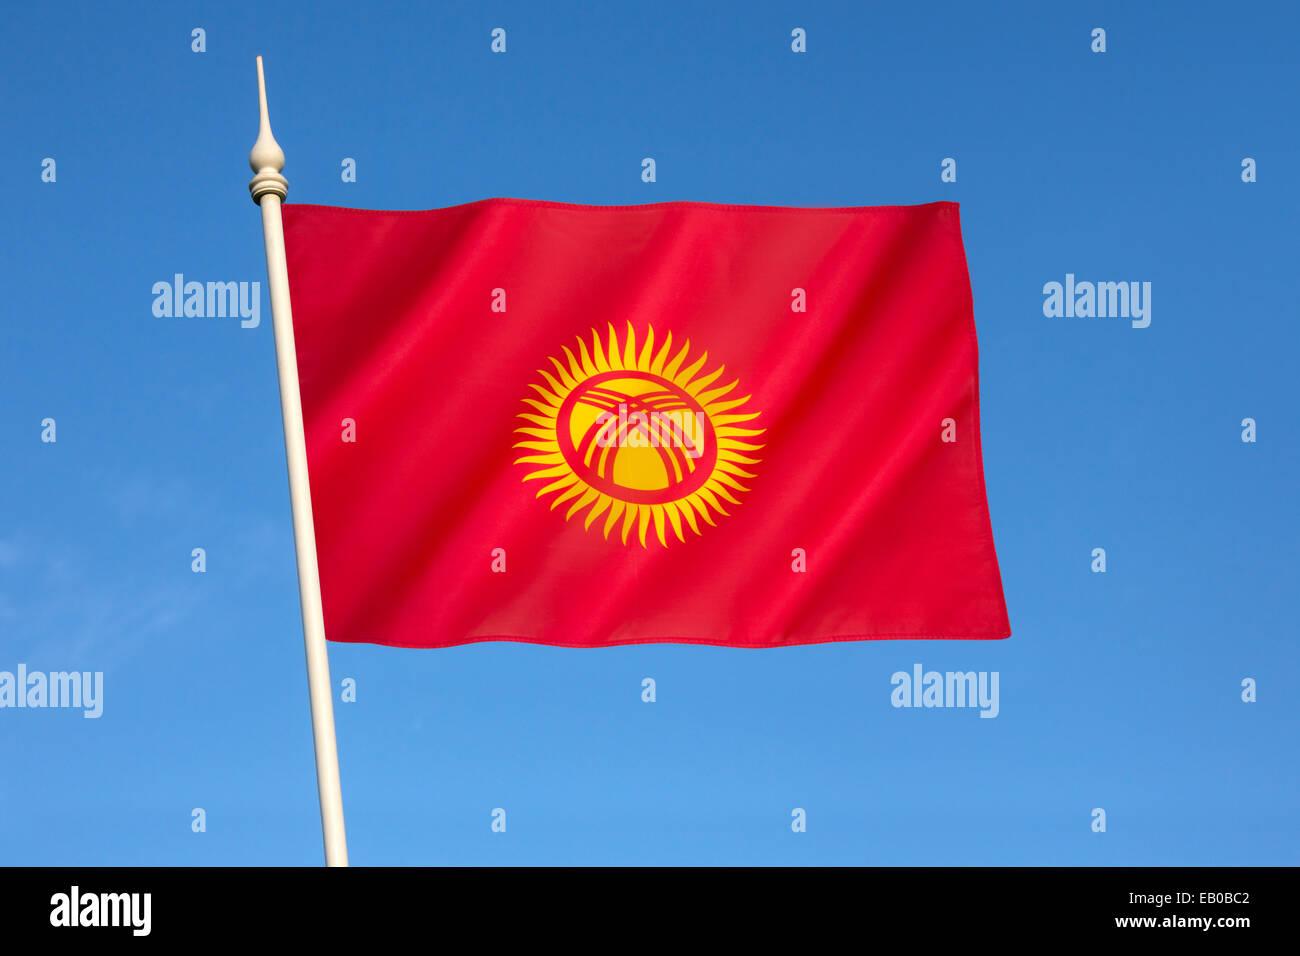 Flag of Kyrgyzstan - Stock Image